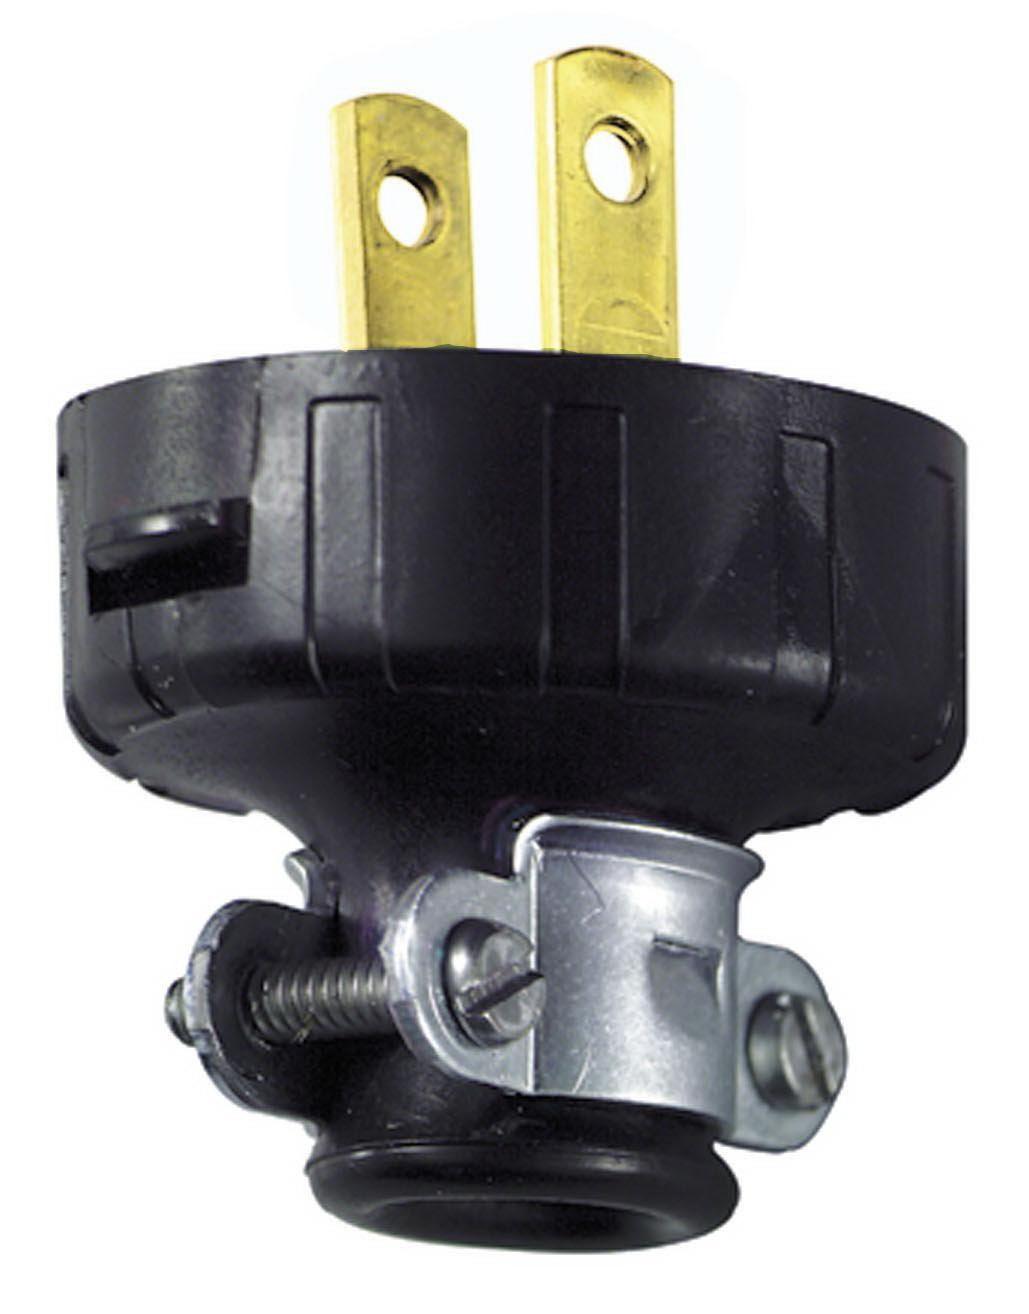 Leviton 000-48646-000 Non-Polarized Round Electrical Plug With Cord Clamp, 125 V, 15 A, 2 P, 2 W, Black